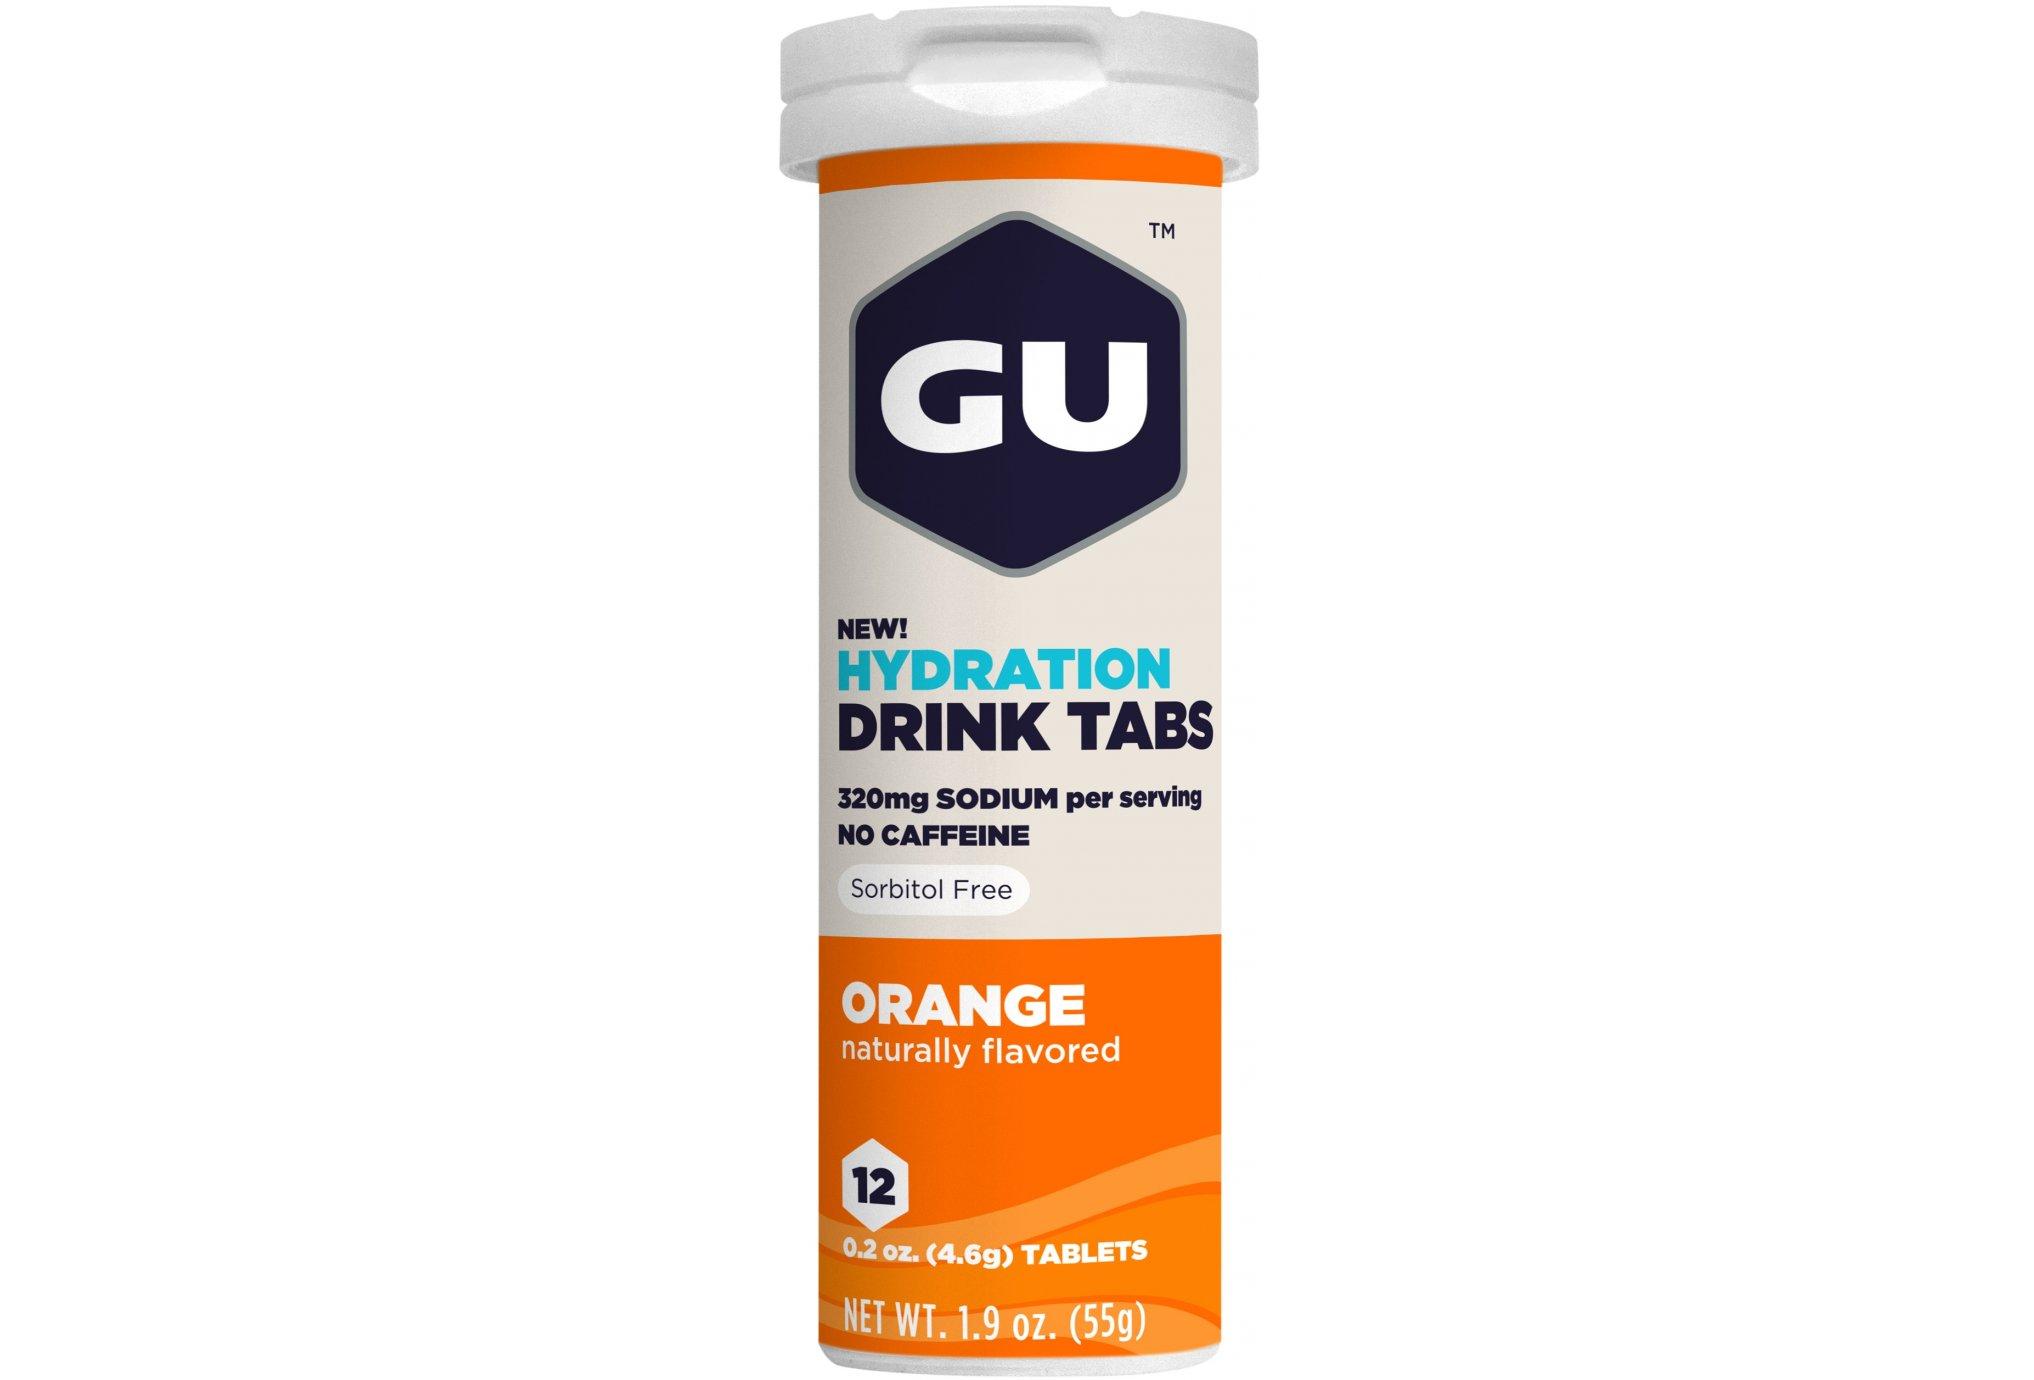 GU Tabletas de hidratación Drink - Naranja Diététique Boissons